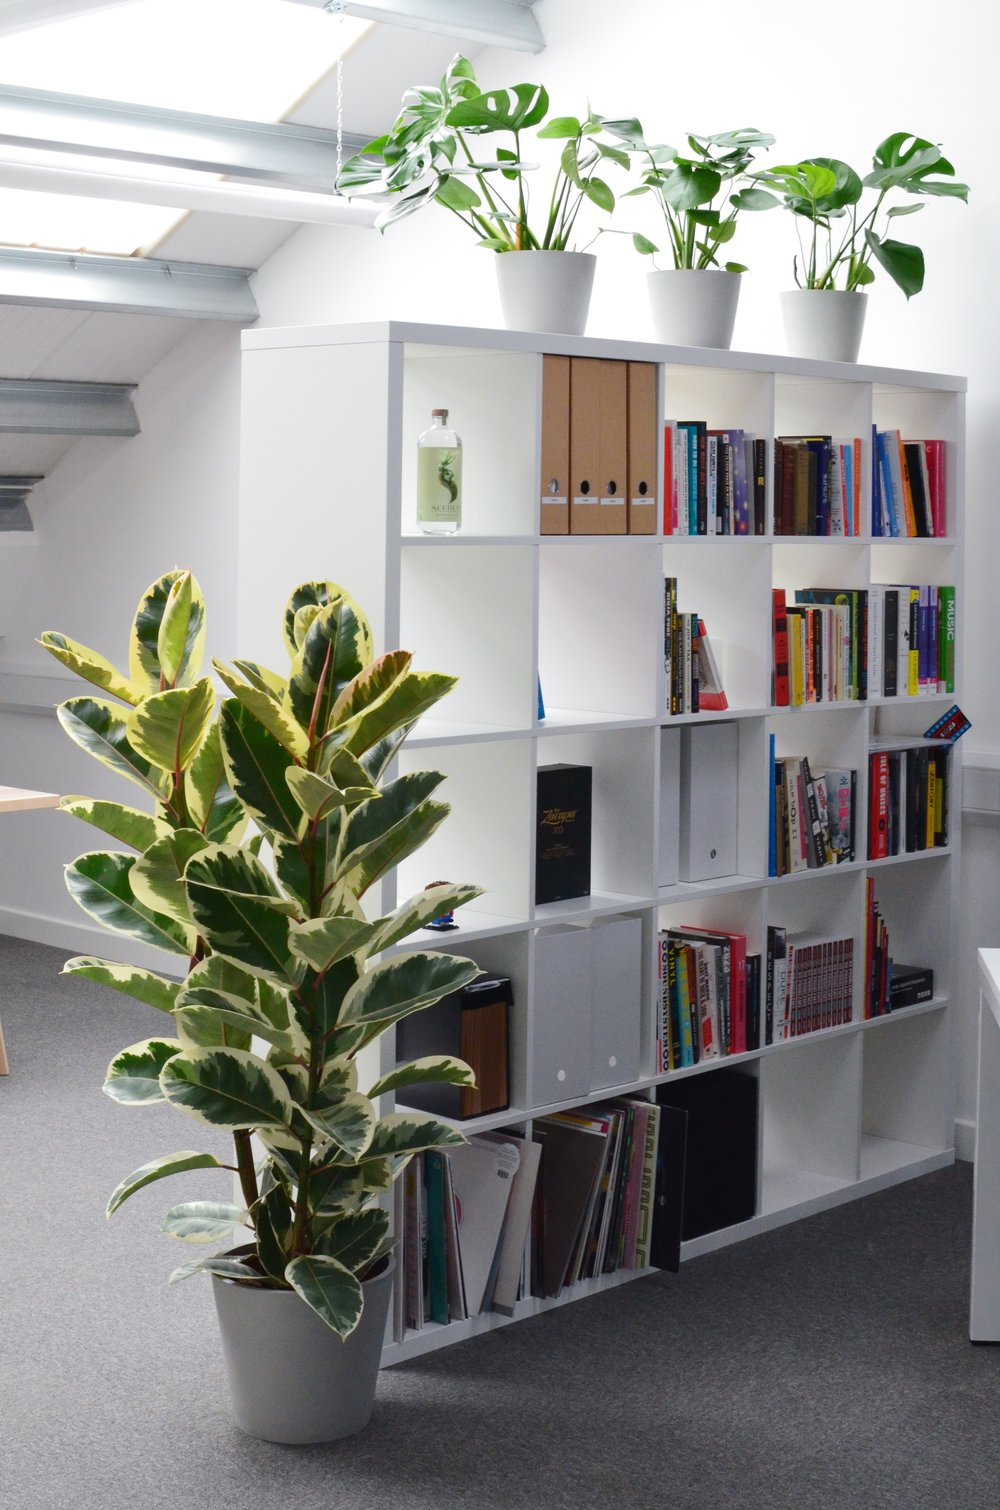 Pilea Plant Shop Houseplant Office Installation 2.JPG